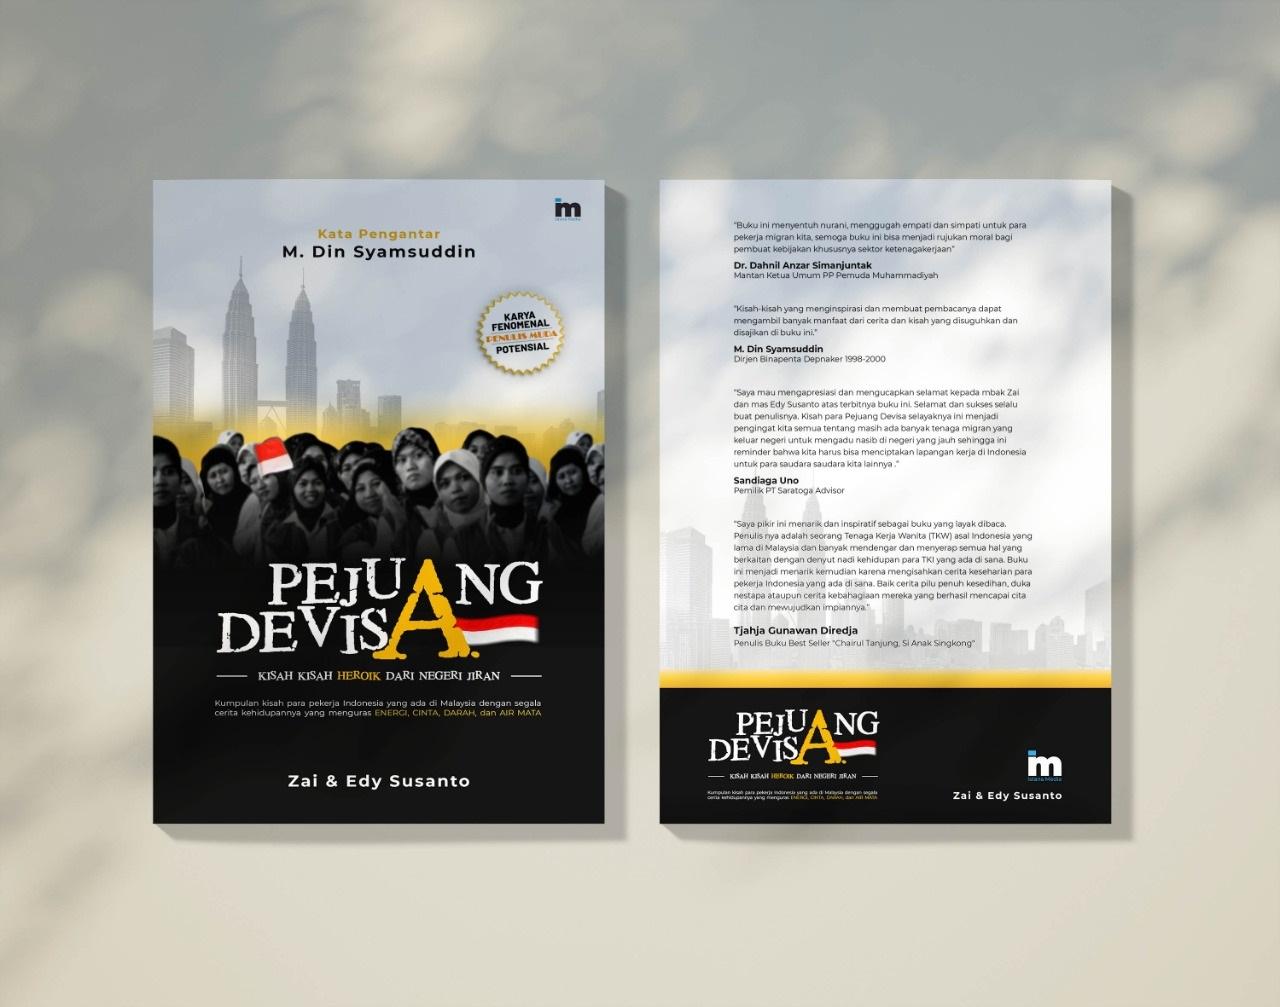 Cerita TKW Indonesia di Malaysia Yang Kisah Pengalamannya Ditulis Menjadi Sebuah Buku BEKASIMEDIA.COM   MEDIA BEKASI SEJAK 2014